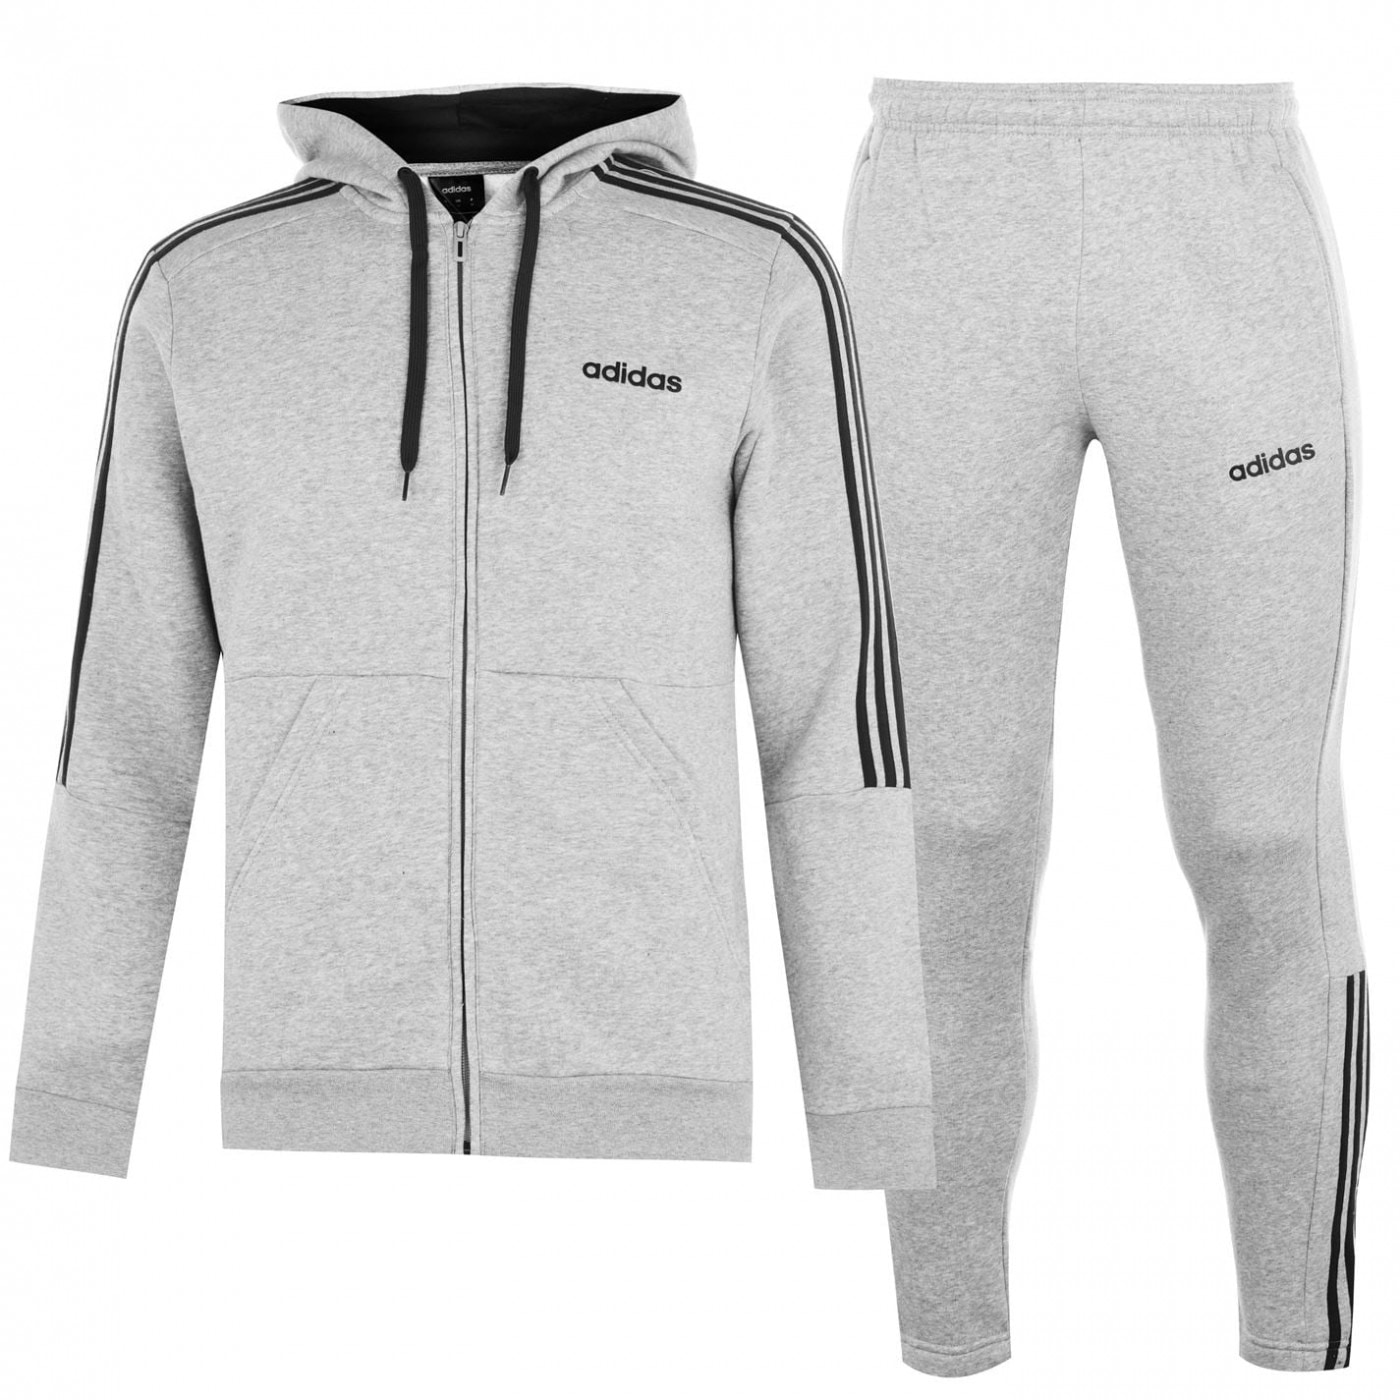 Adidas Three Stripe Jogger Suit Mens